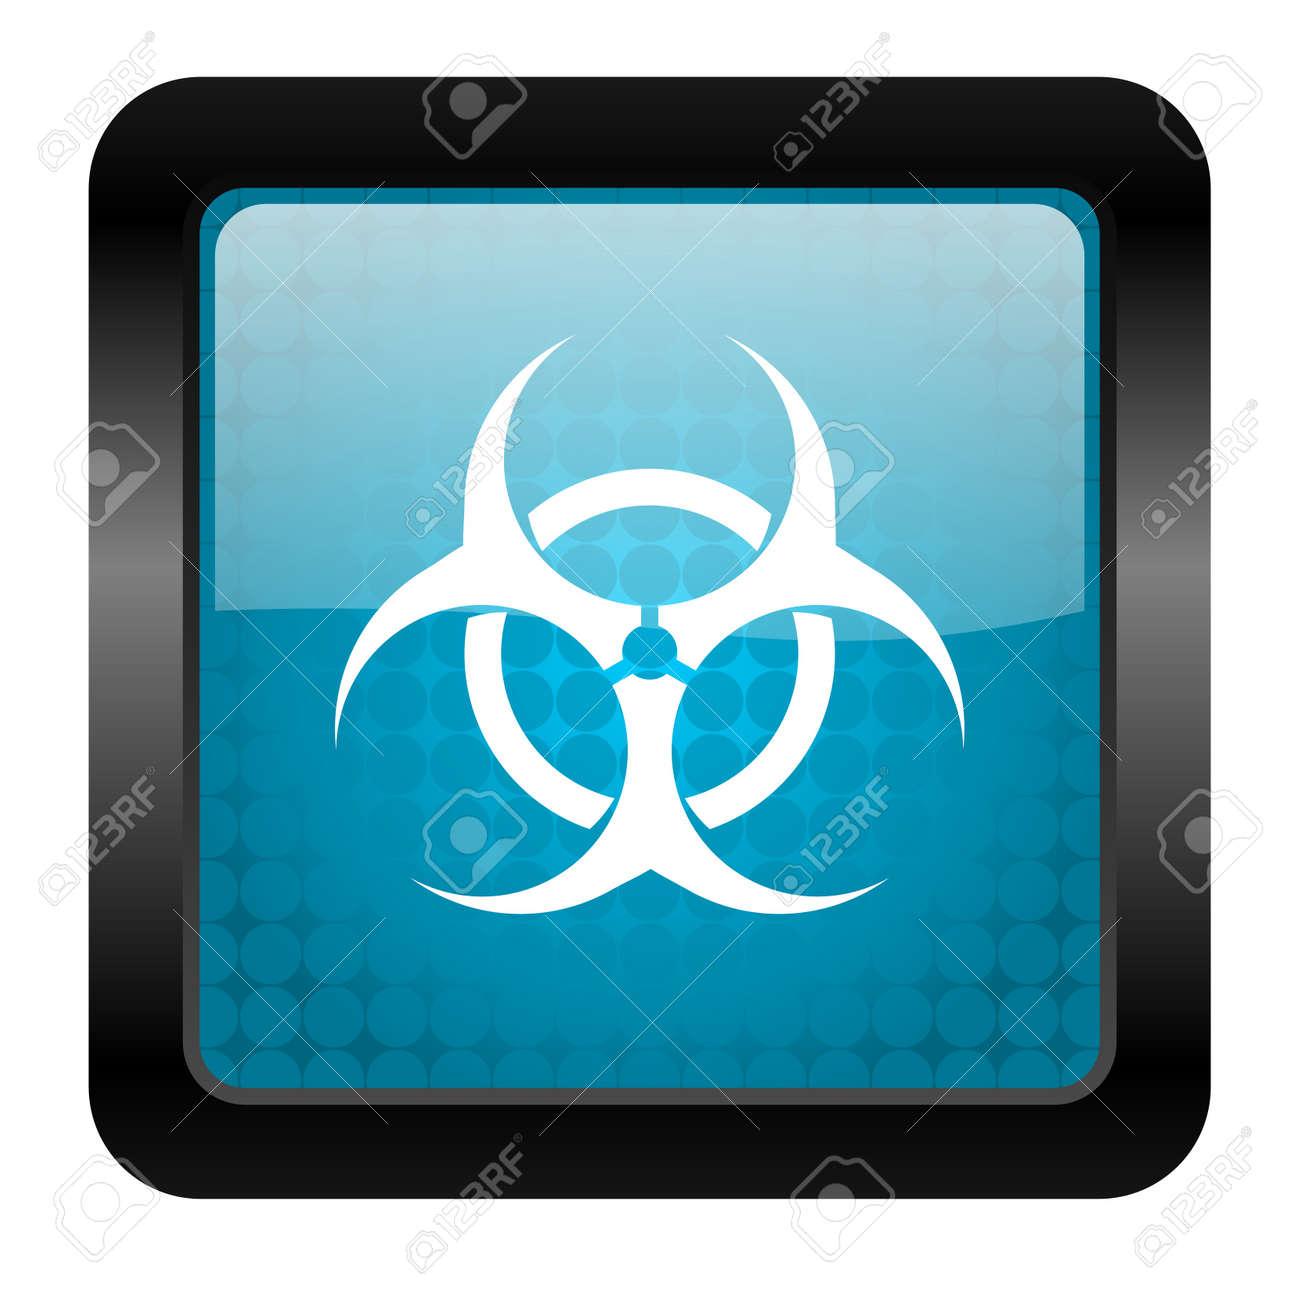 virus icon Stock Photo - 15462634